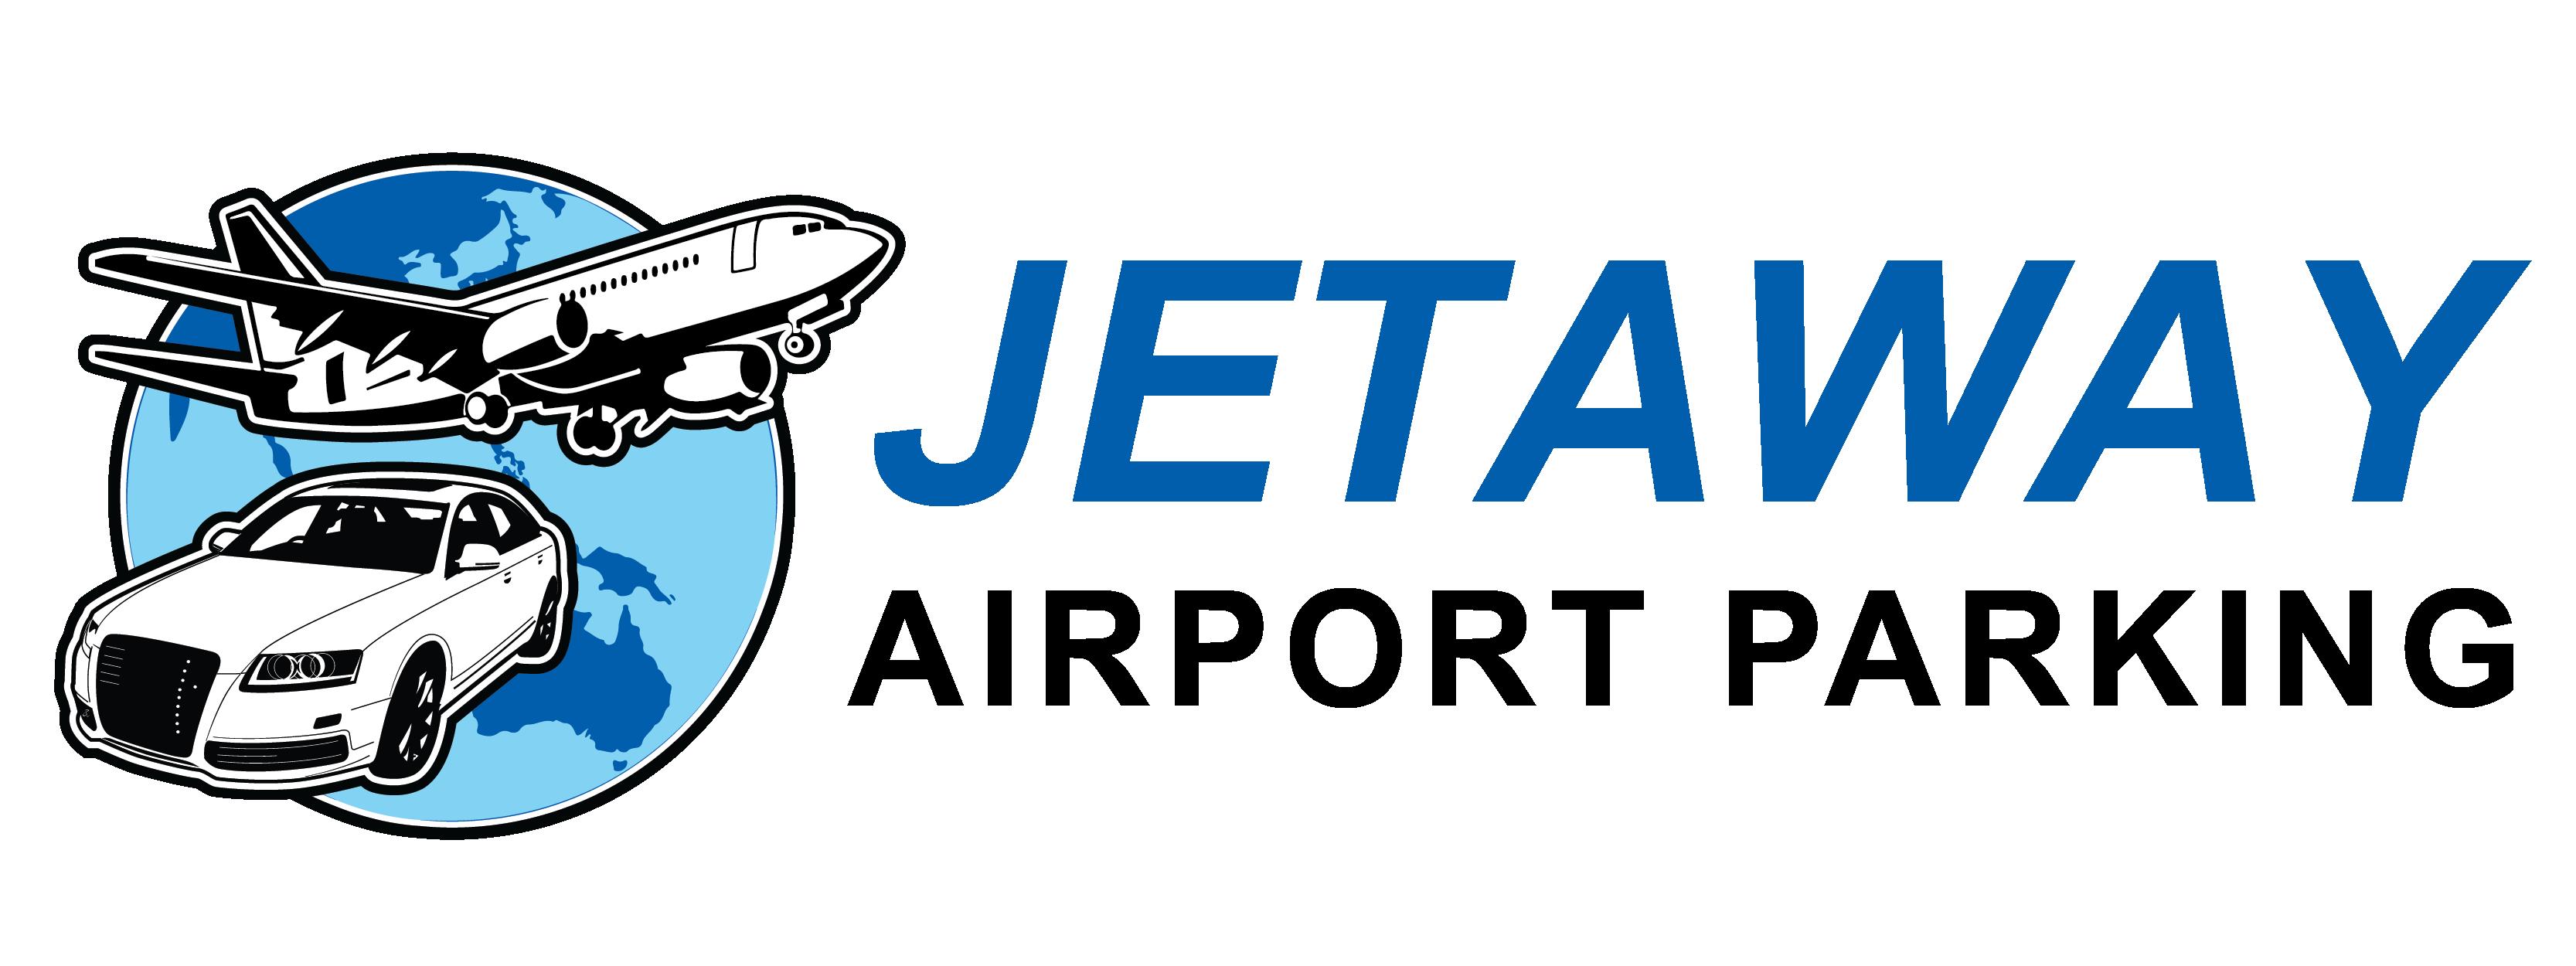 Jetaway airport parking